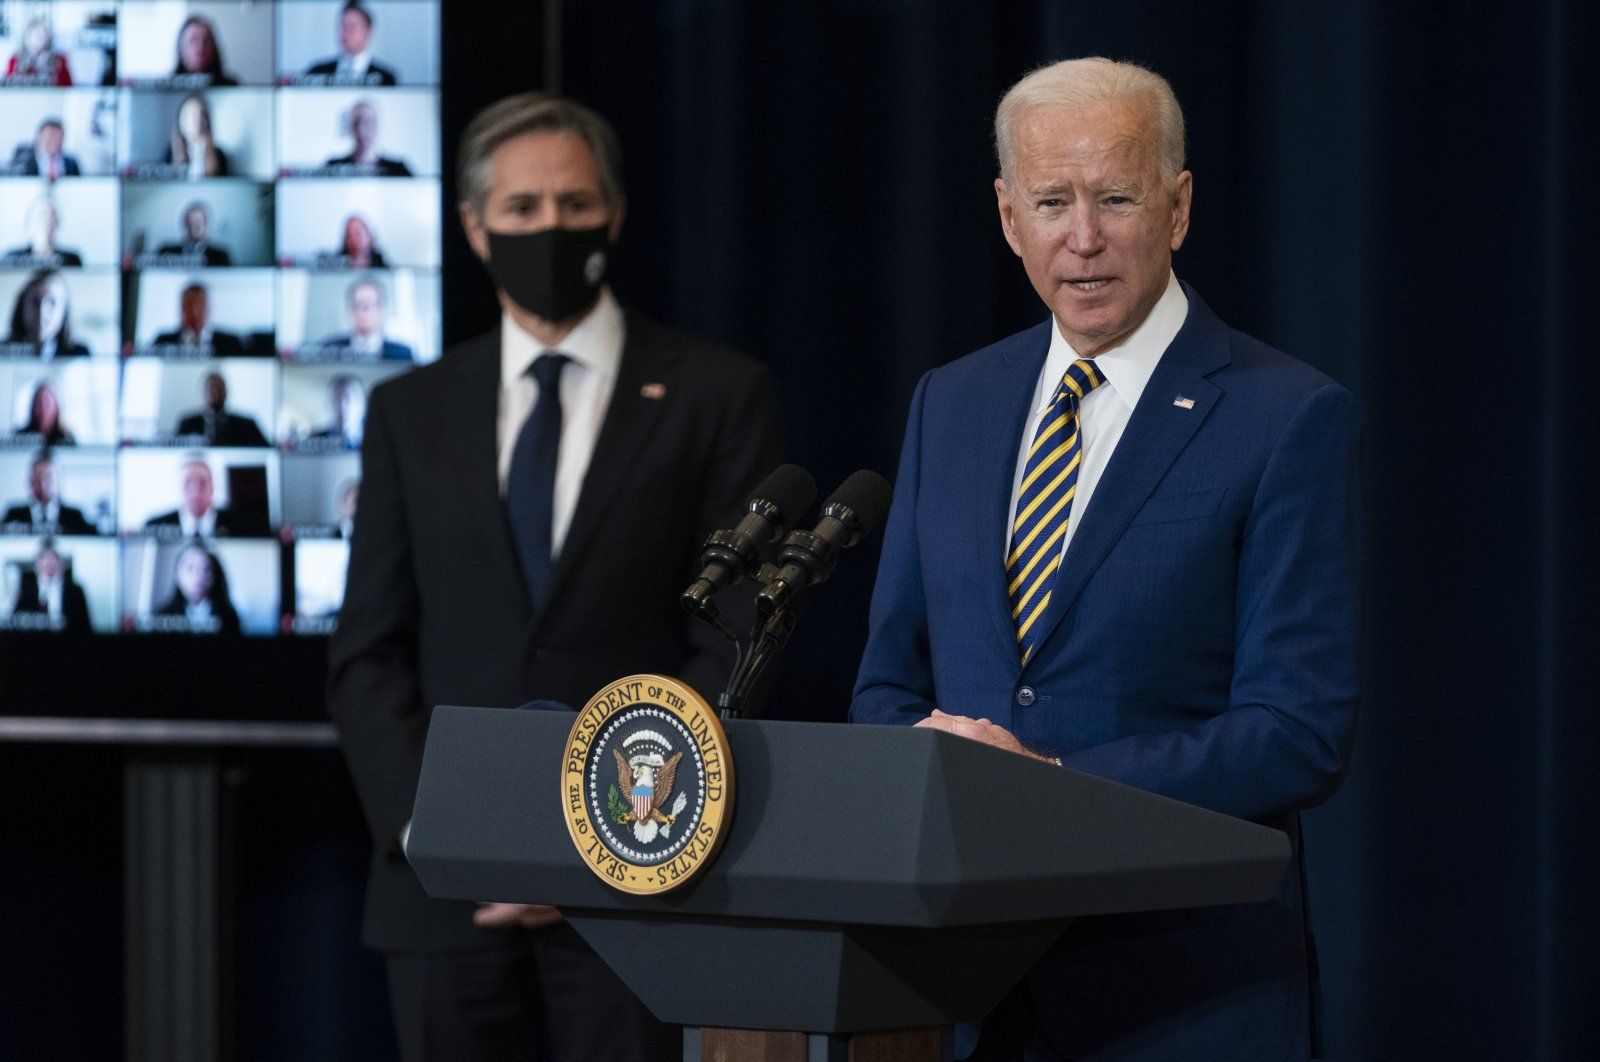 U.S. Secretary of State Antony Blinken listens as U.S. President Joe Biden delivers remarks to State Department staff, Washington, D.C., the U.S., Feb. 4, 2021. (AP Photo)